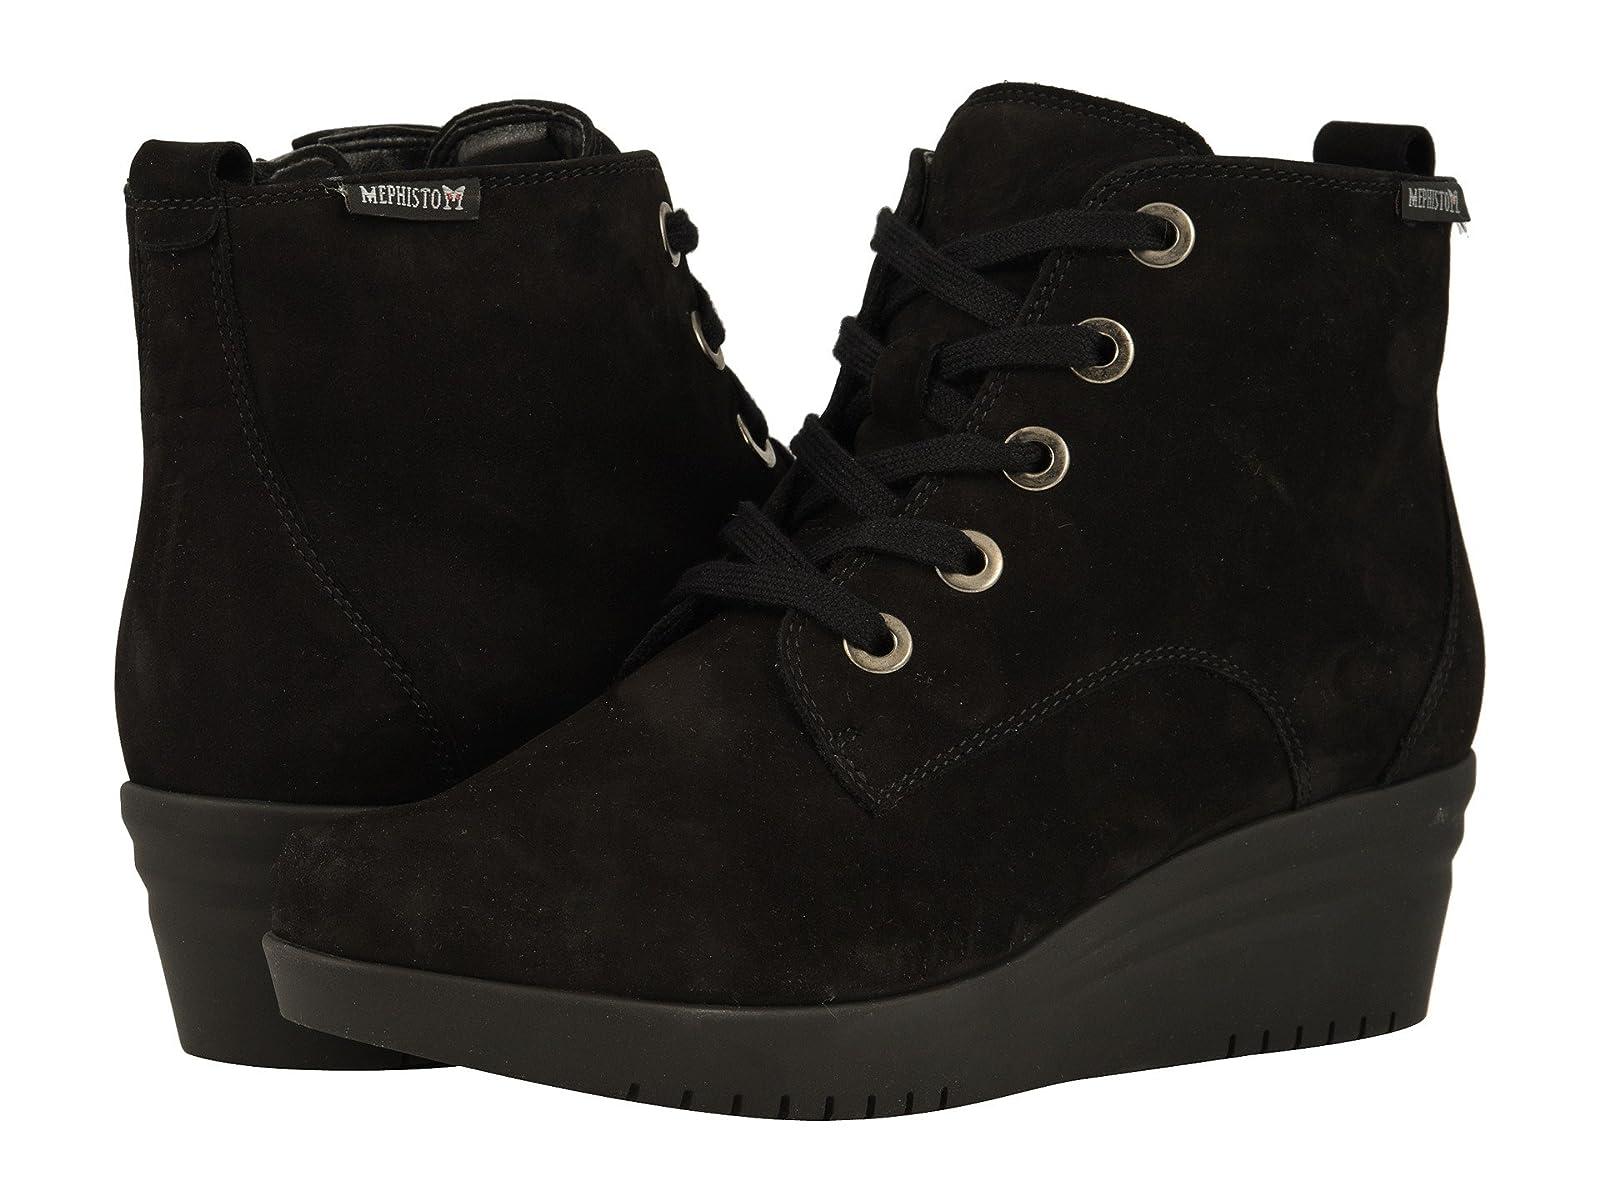 Mephisto GeorginaAtmospheric grades have affordable shoes